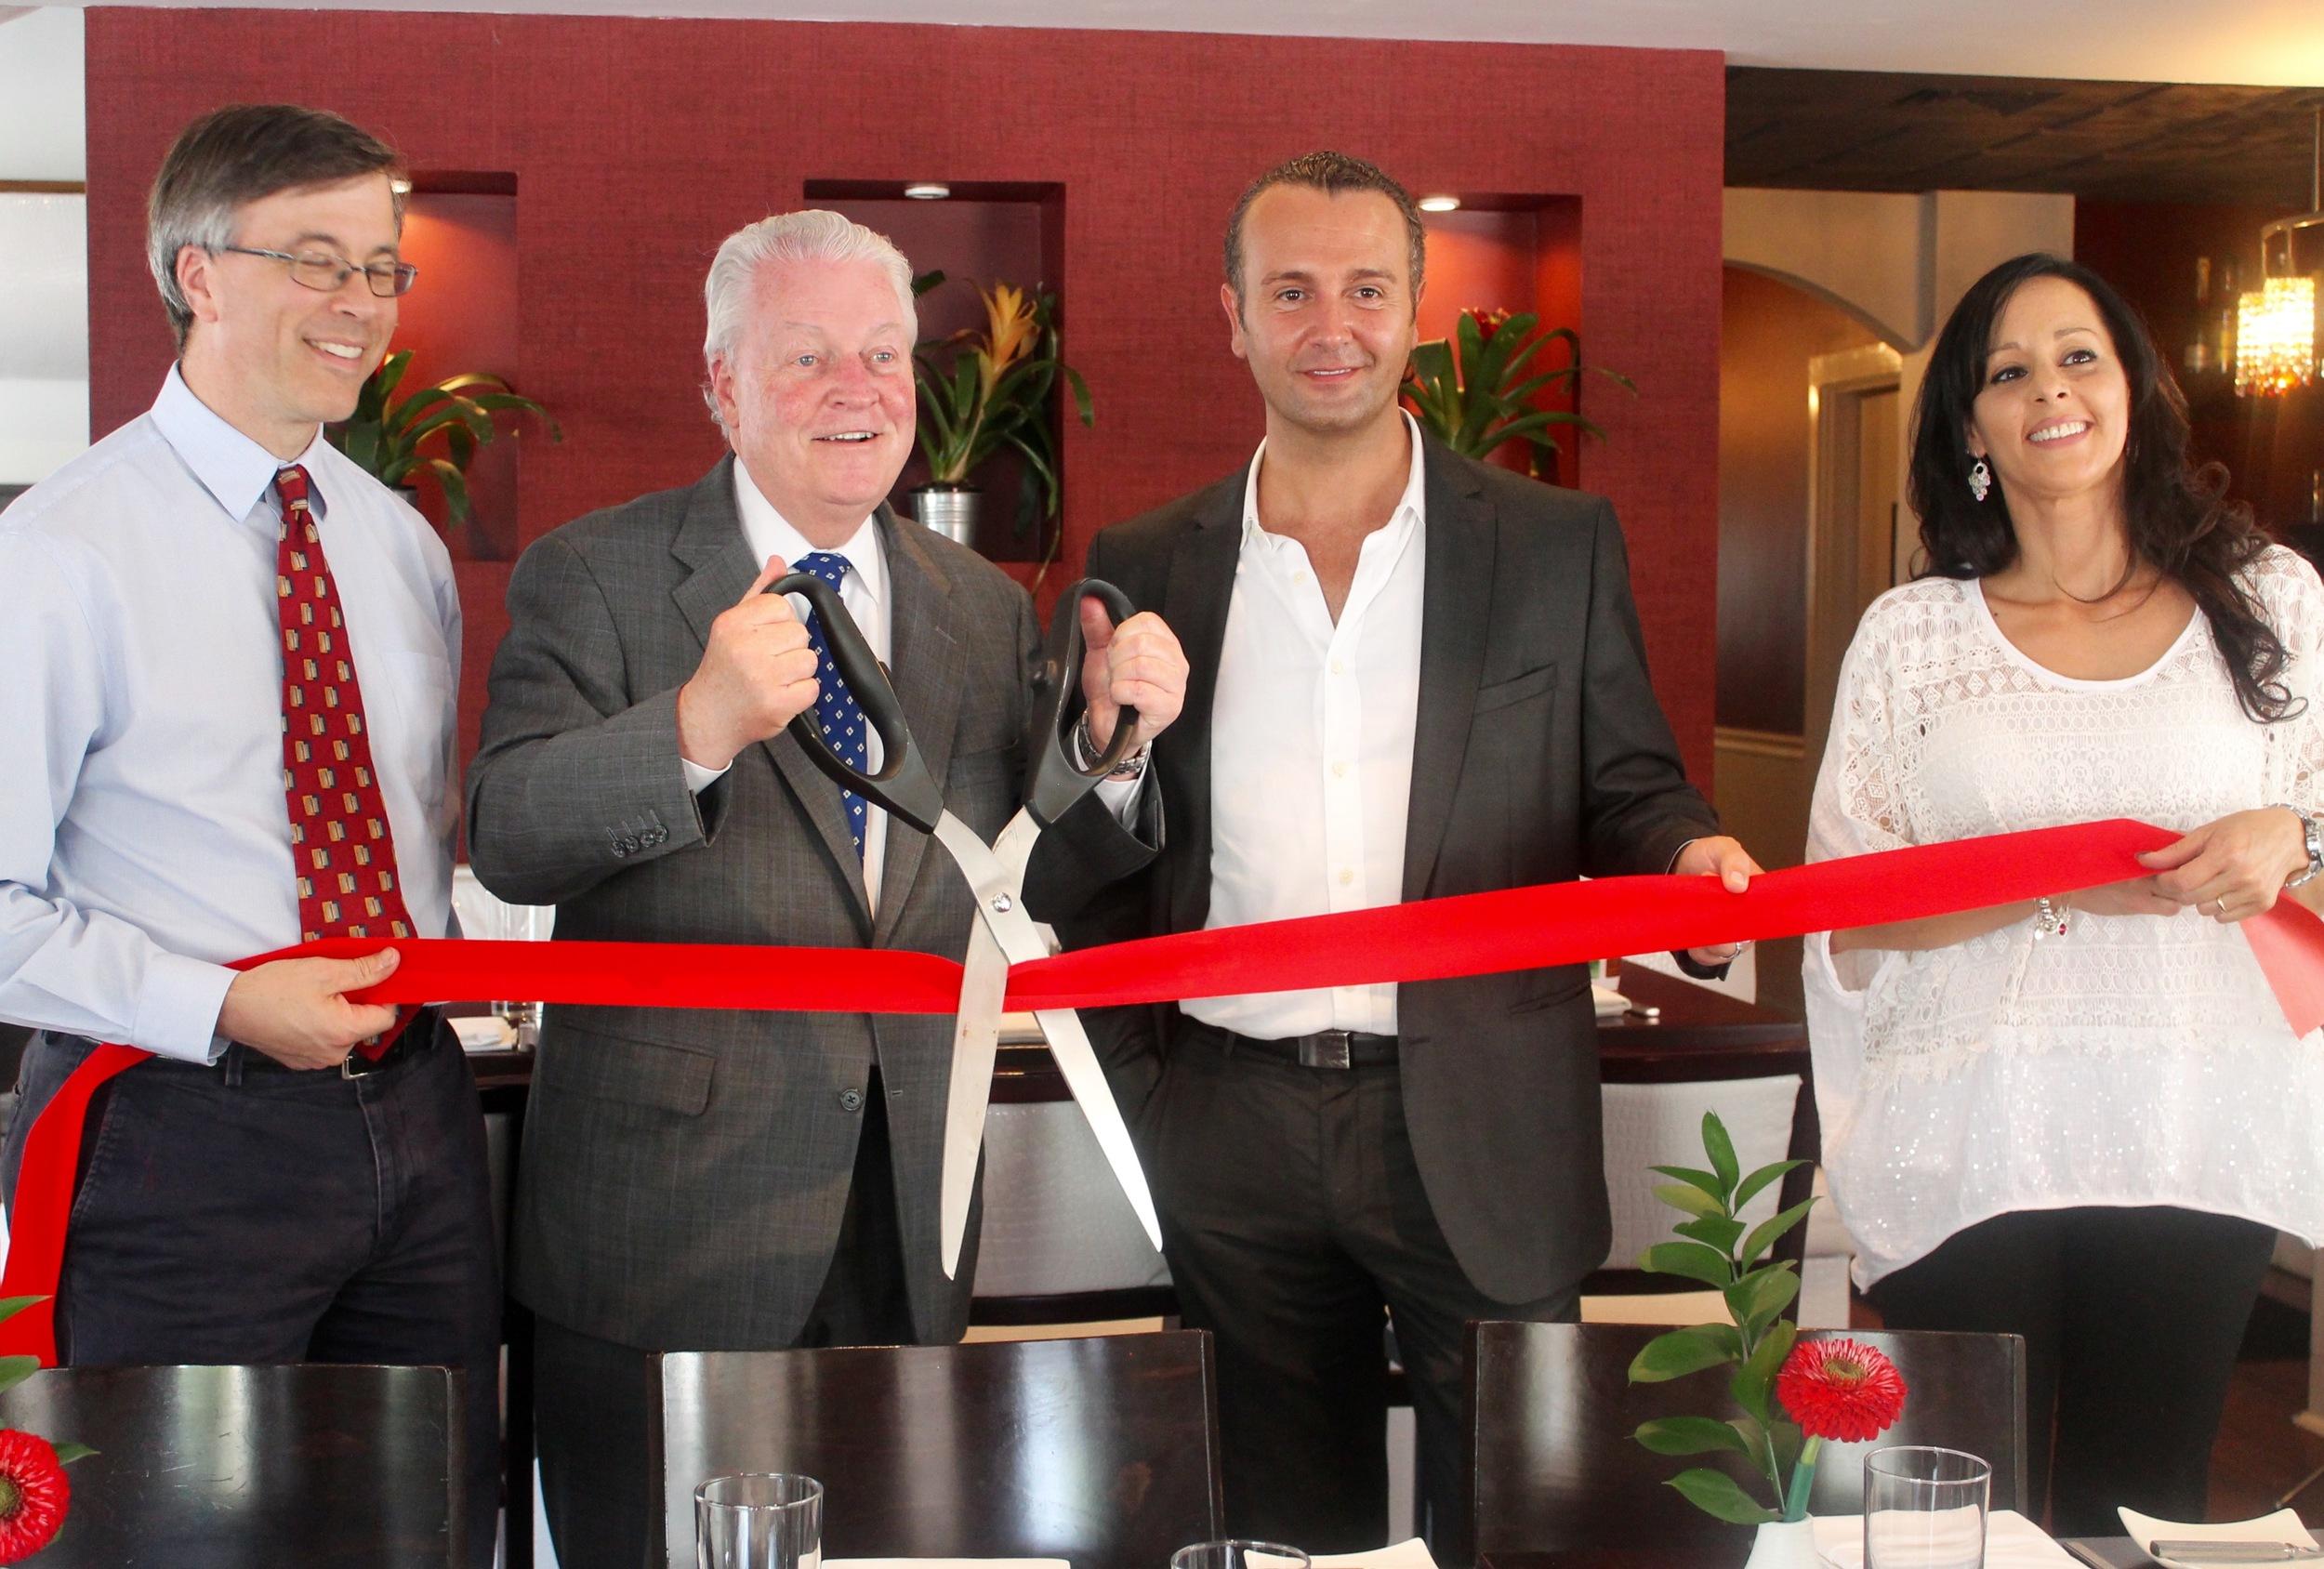 Toto Restaurant, Fairfield CT. Above: Mark Barnhart , Fairfield First Selectman Michael Tetreau, Antonio Ninivaggi and his wife Elena